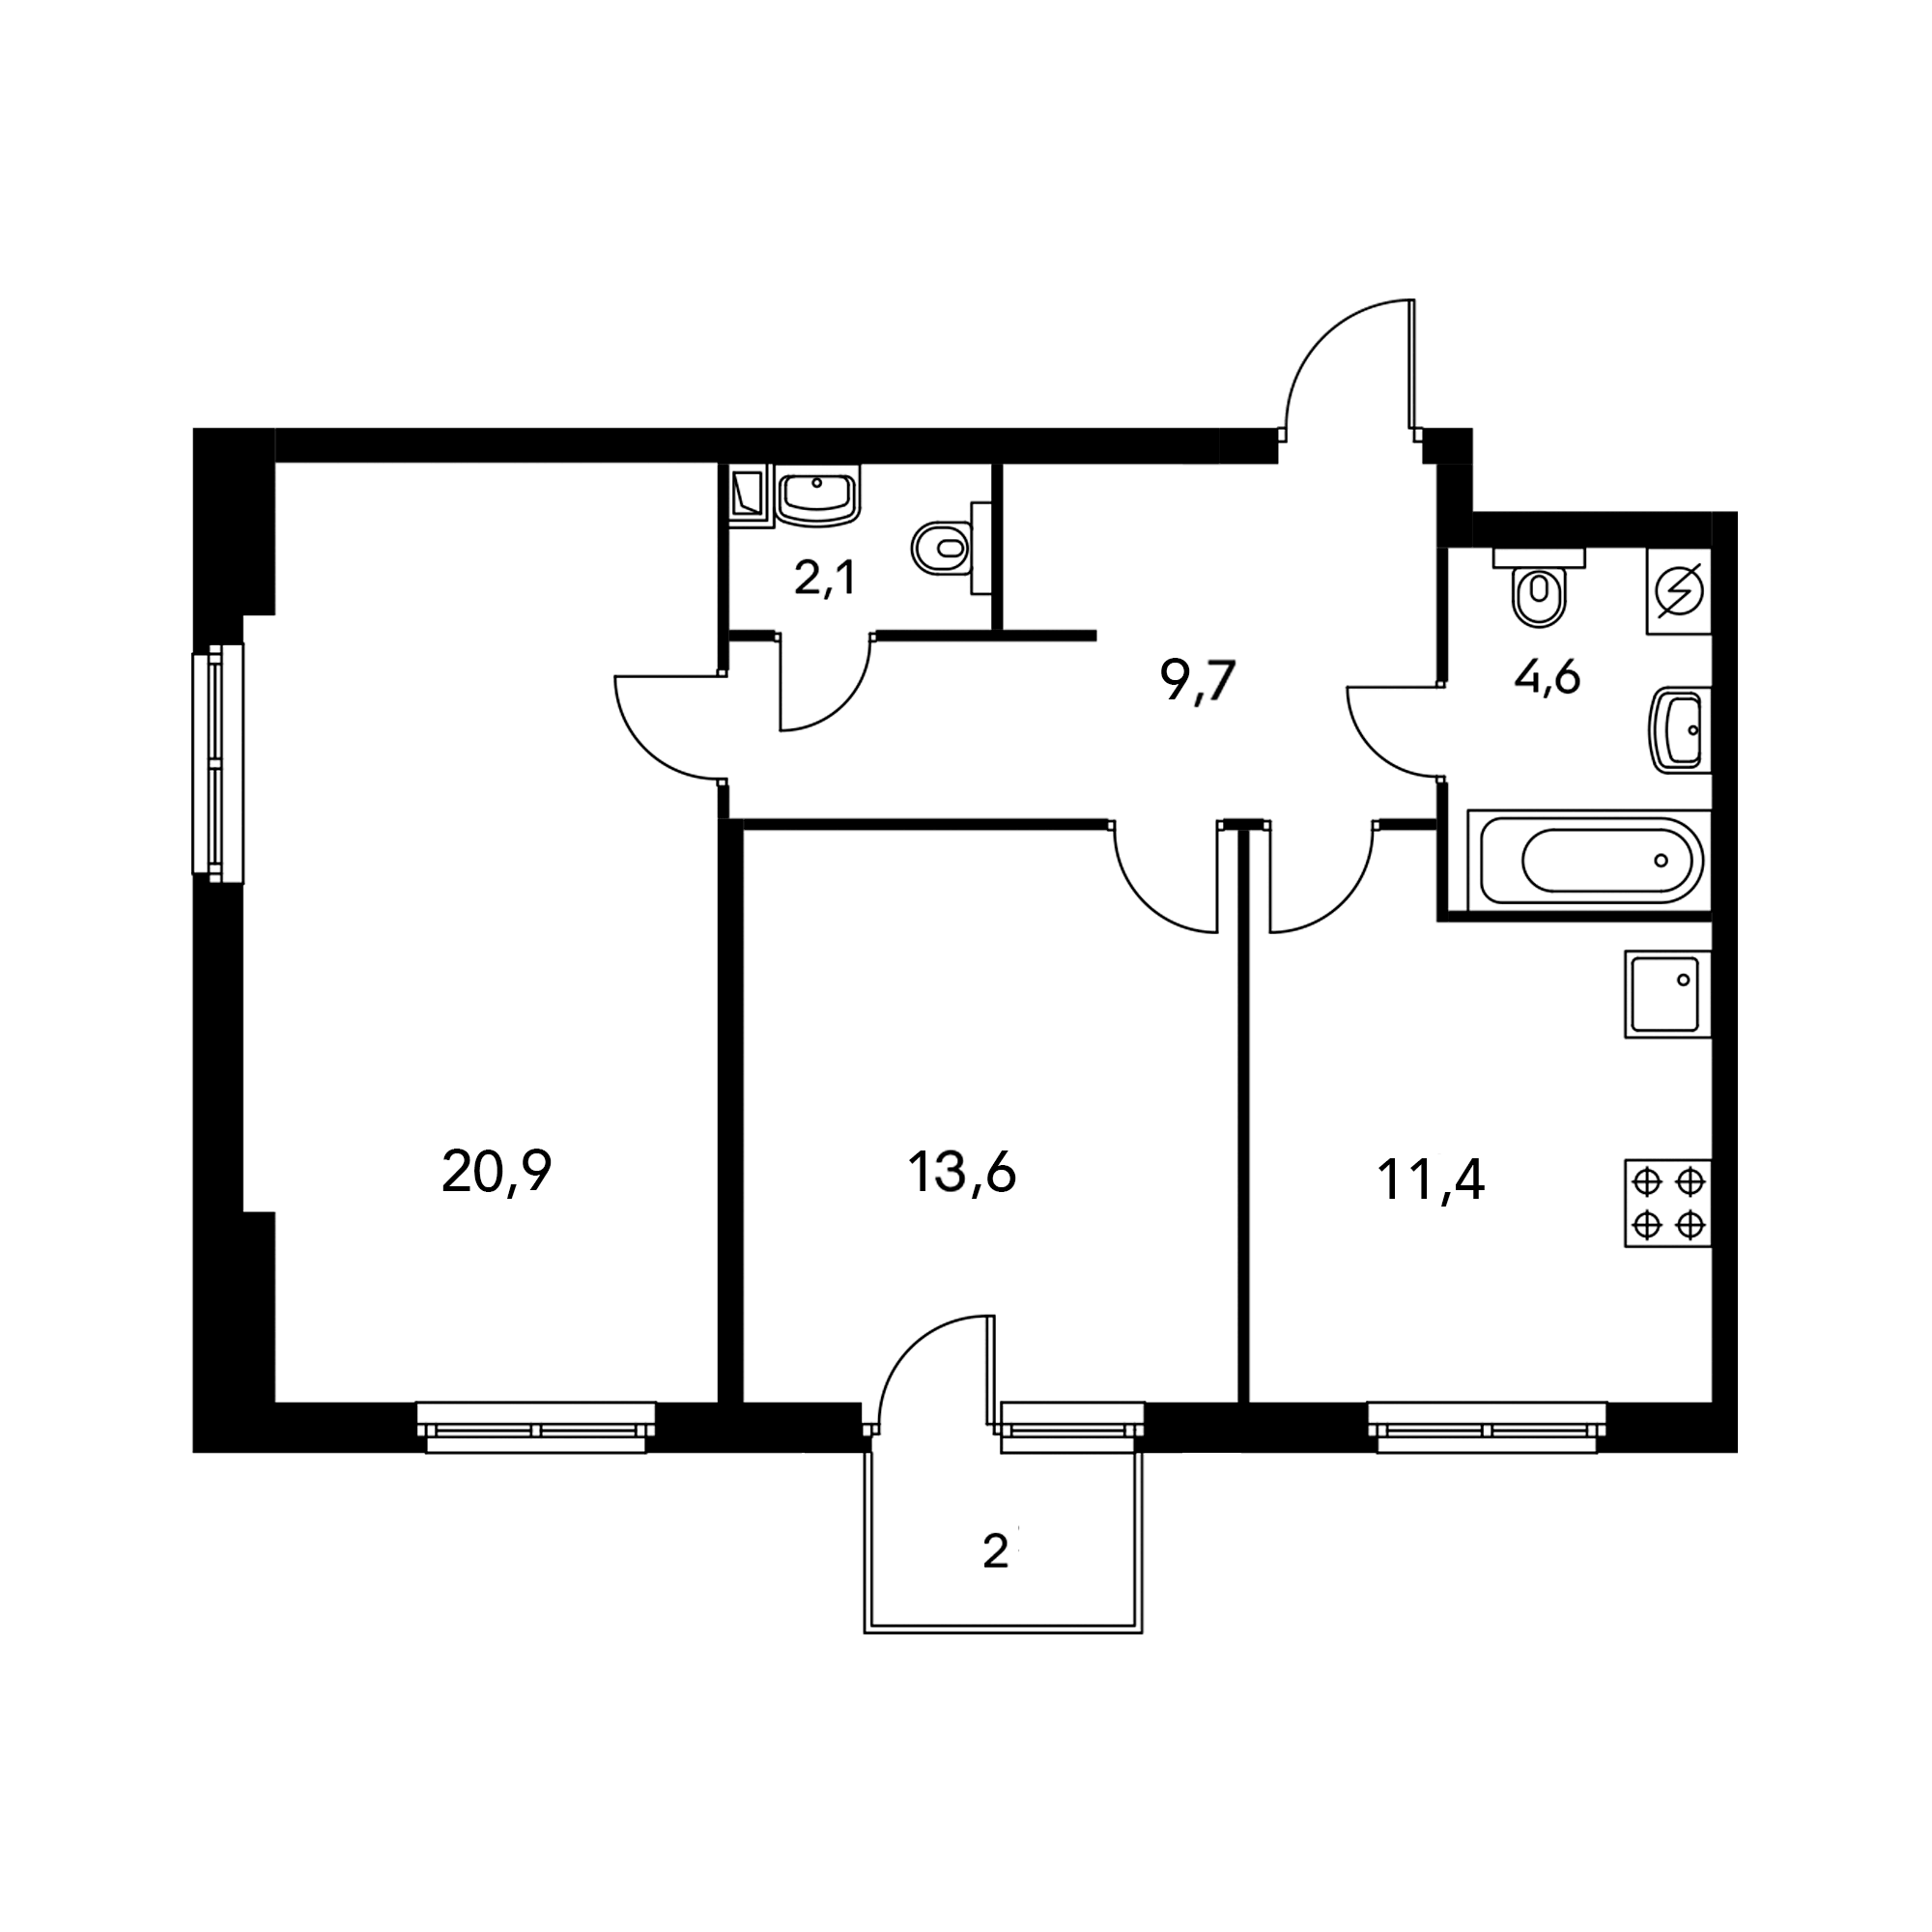 2KM6_10.2-B3